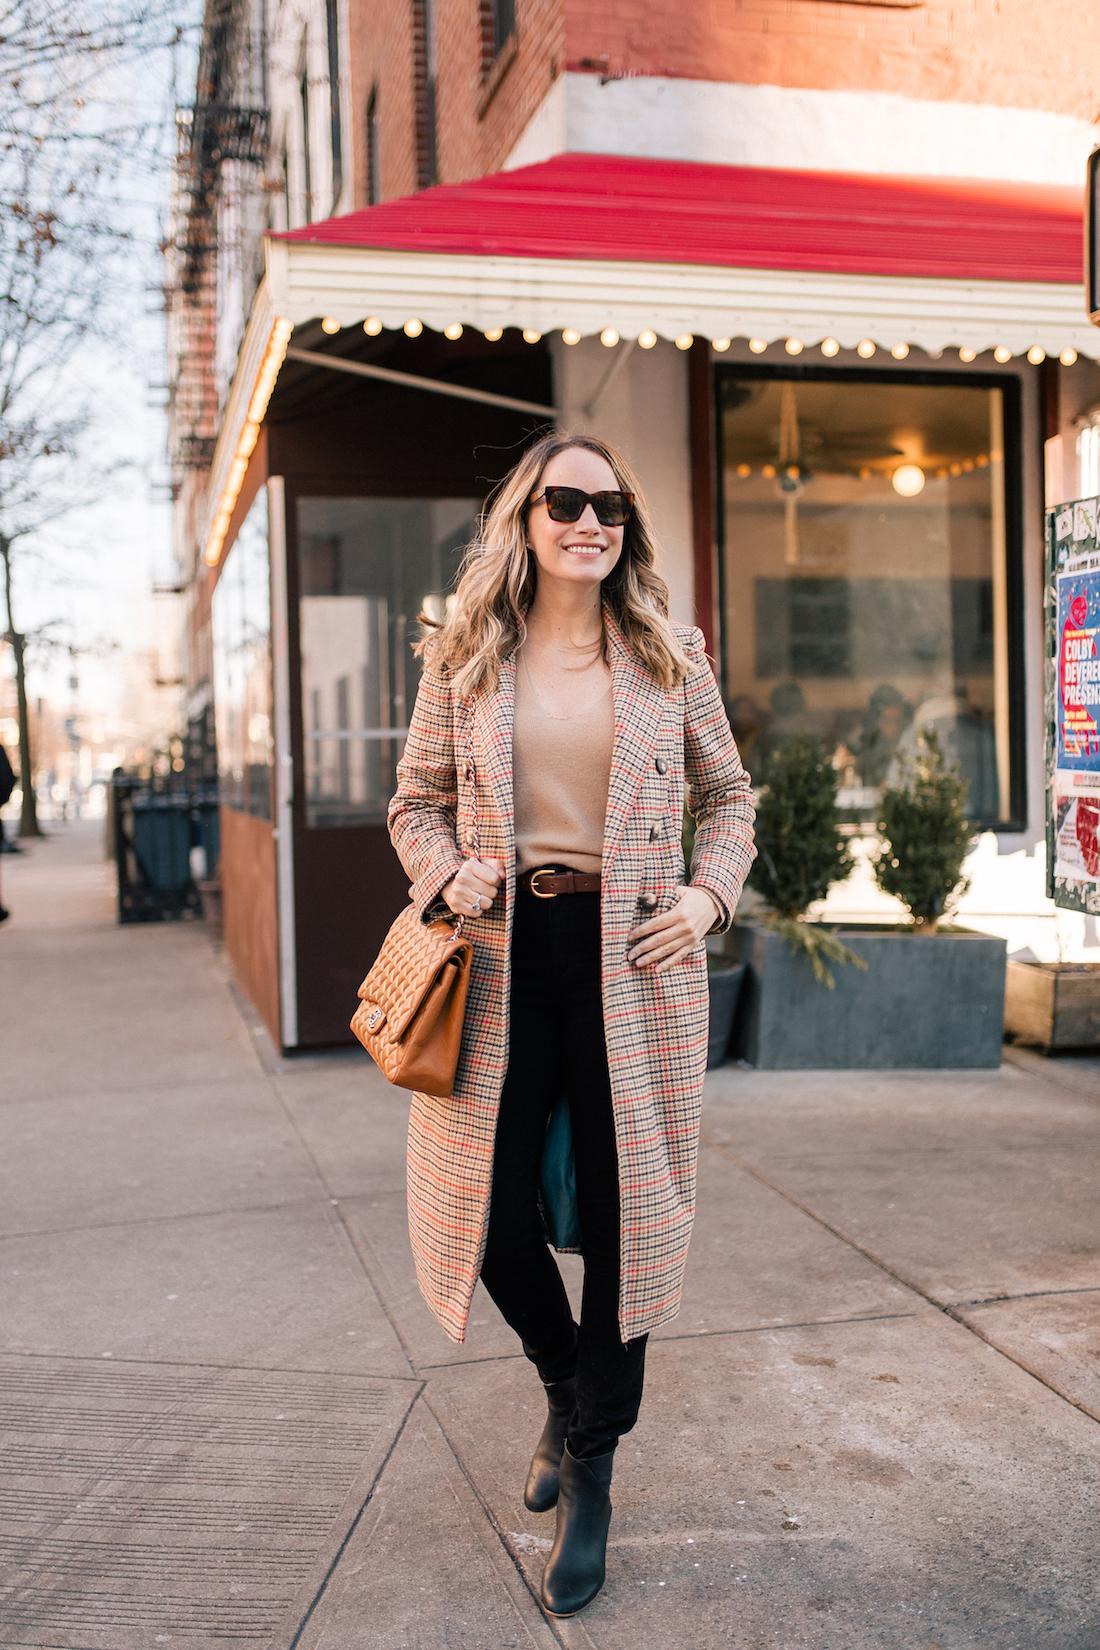 Outfit Details:Topshop Coat // Theory Cashmere Sweater // Paige Jeans // Celine Sunglasses // J.Crew Belt // Soludos Boots // Chanel Purse